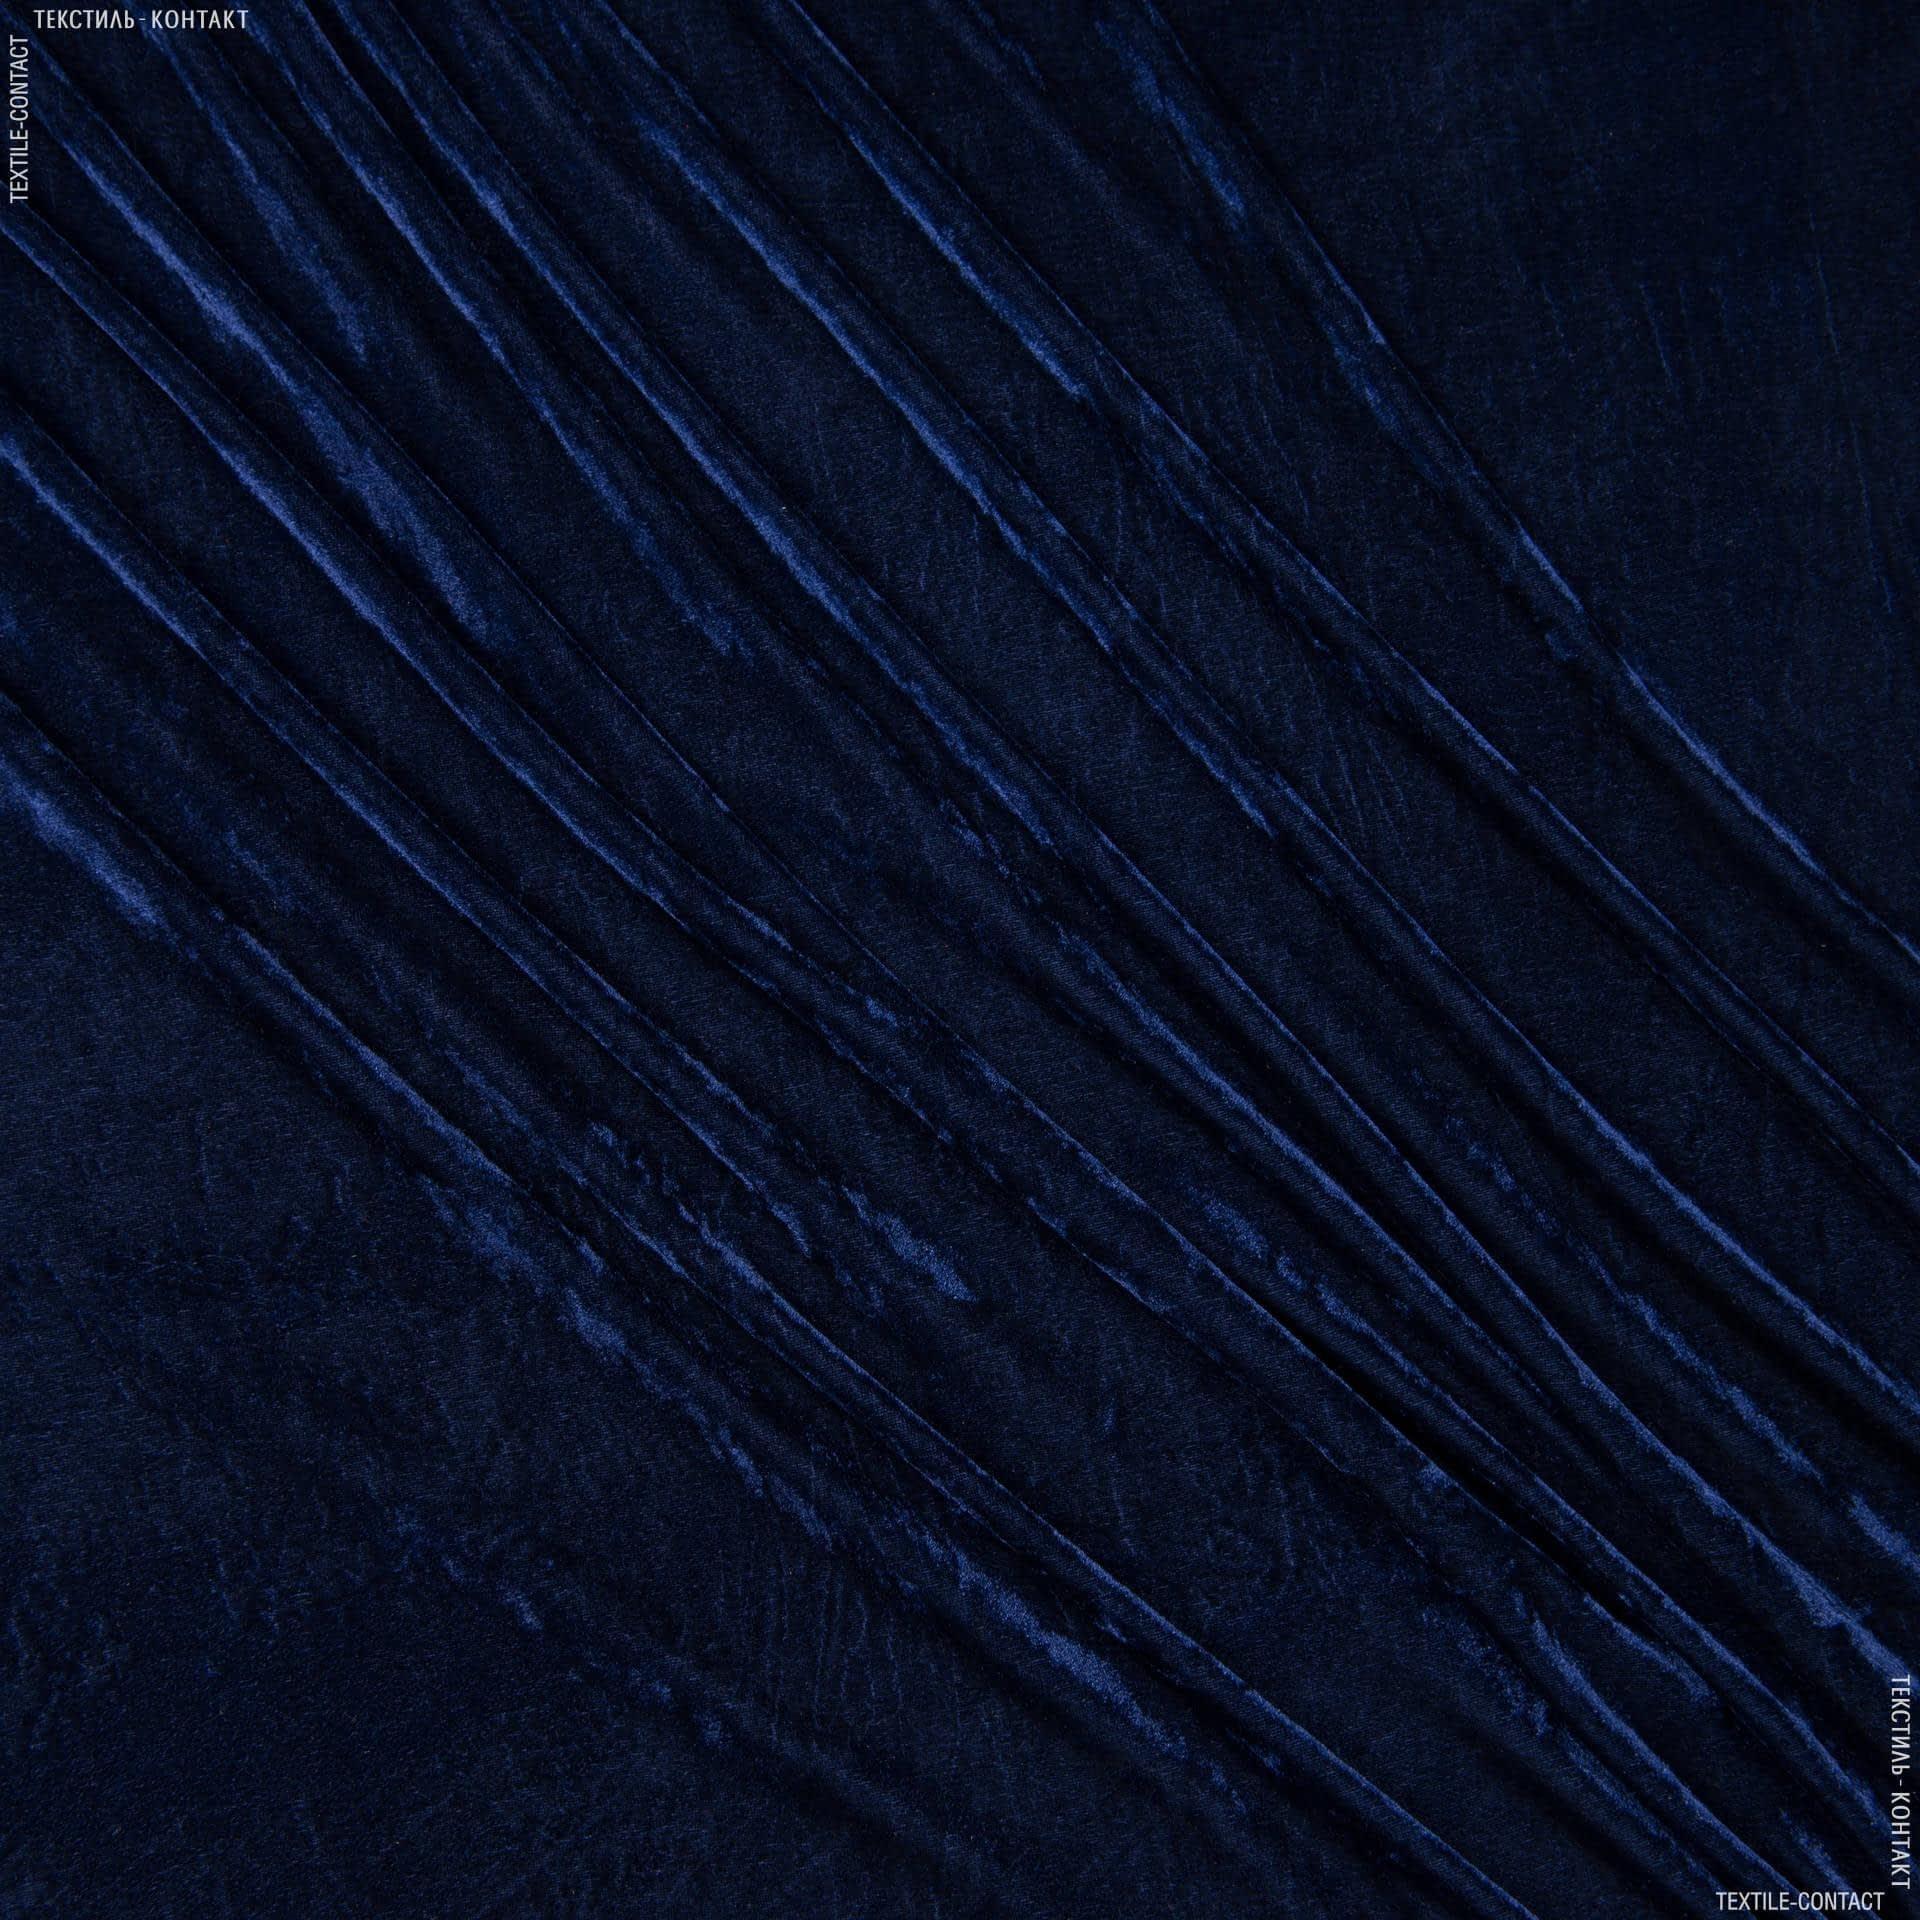 Ткани для платьев - Велюр стрейч темно-синий